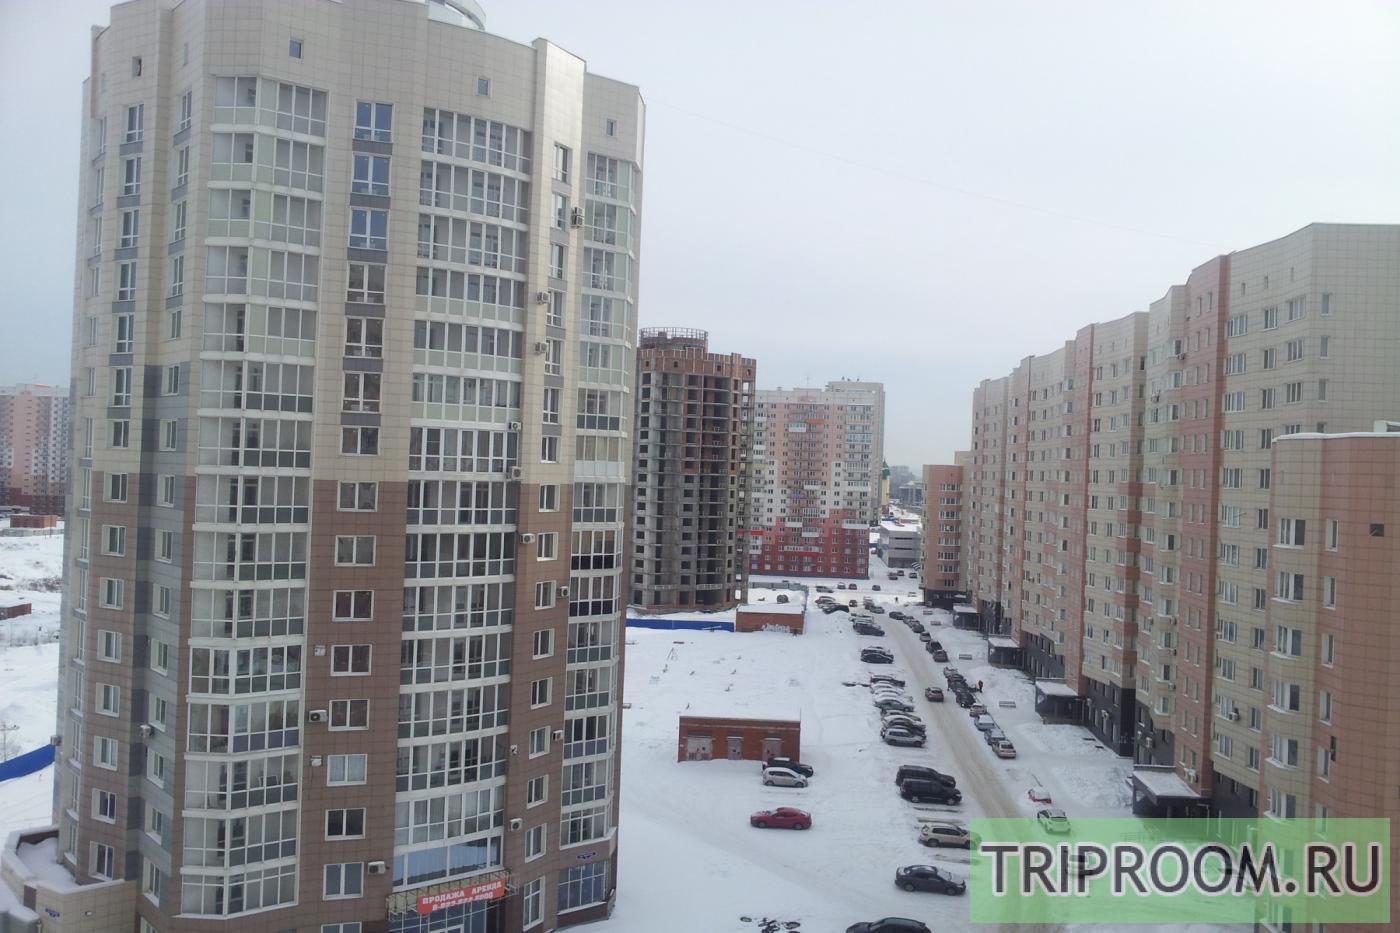 1-комнатная квартира посуточно (вариант № 30838), ул. Ермакова улица, фото № 2